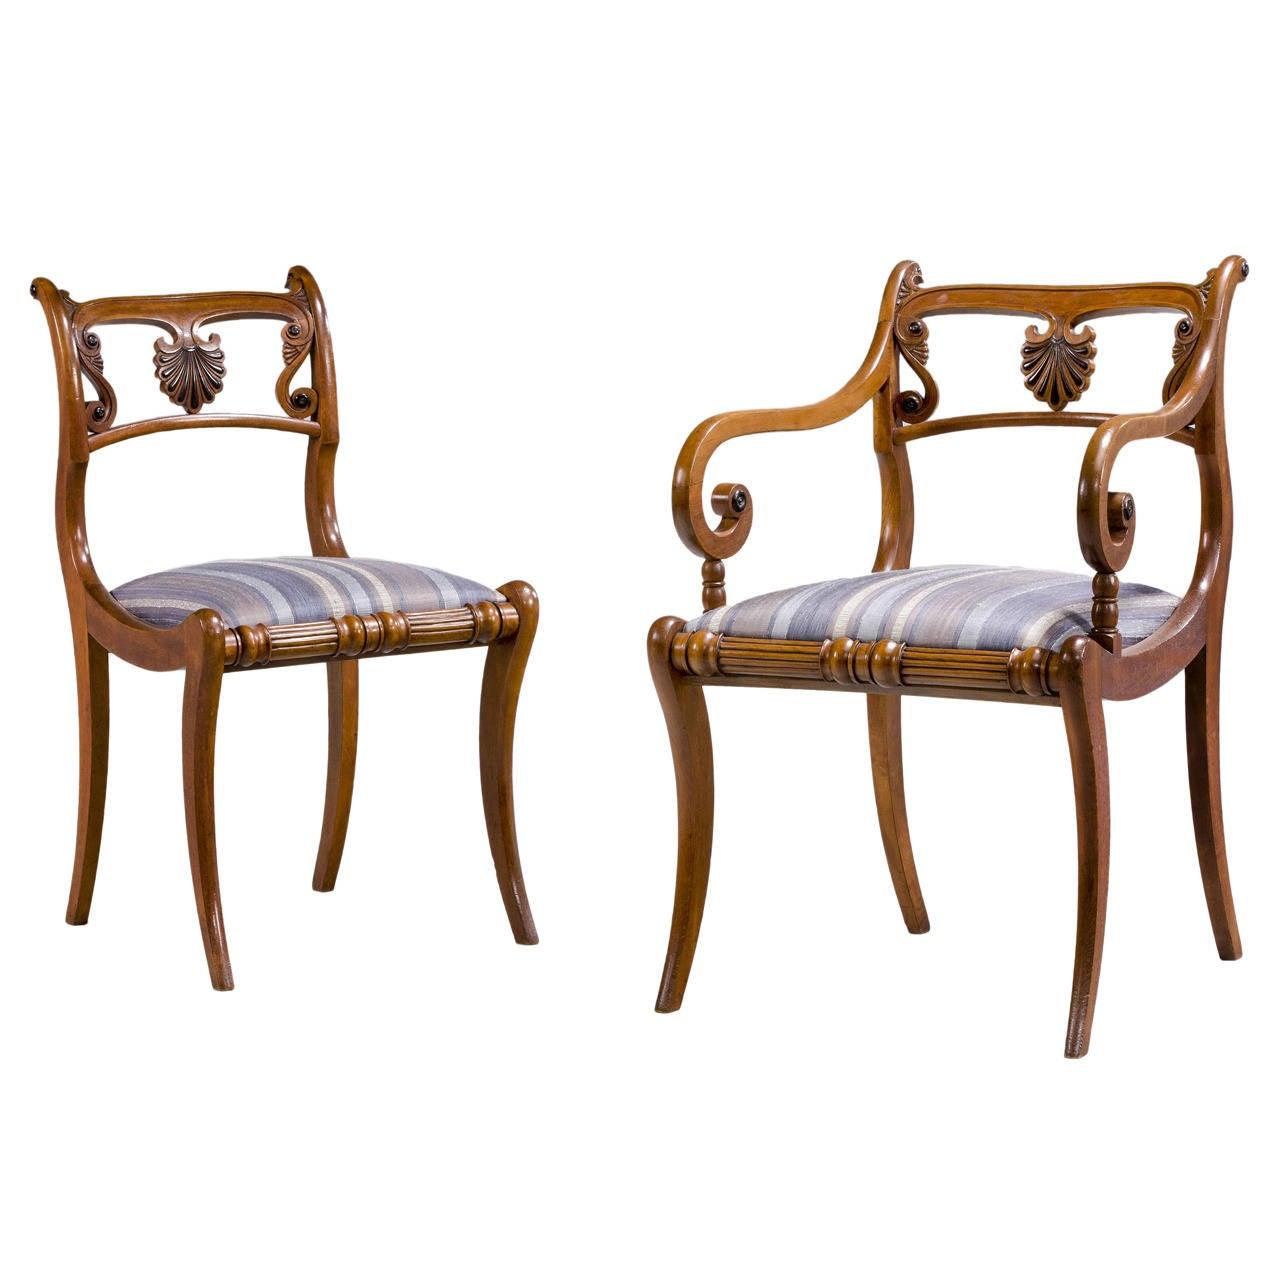 Set of Ten Regency Period Dining Chairs